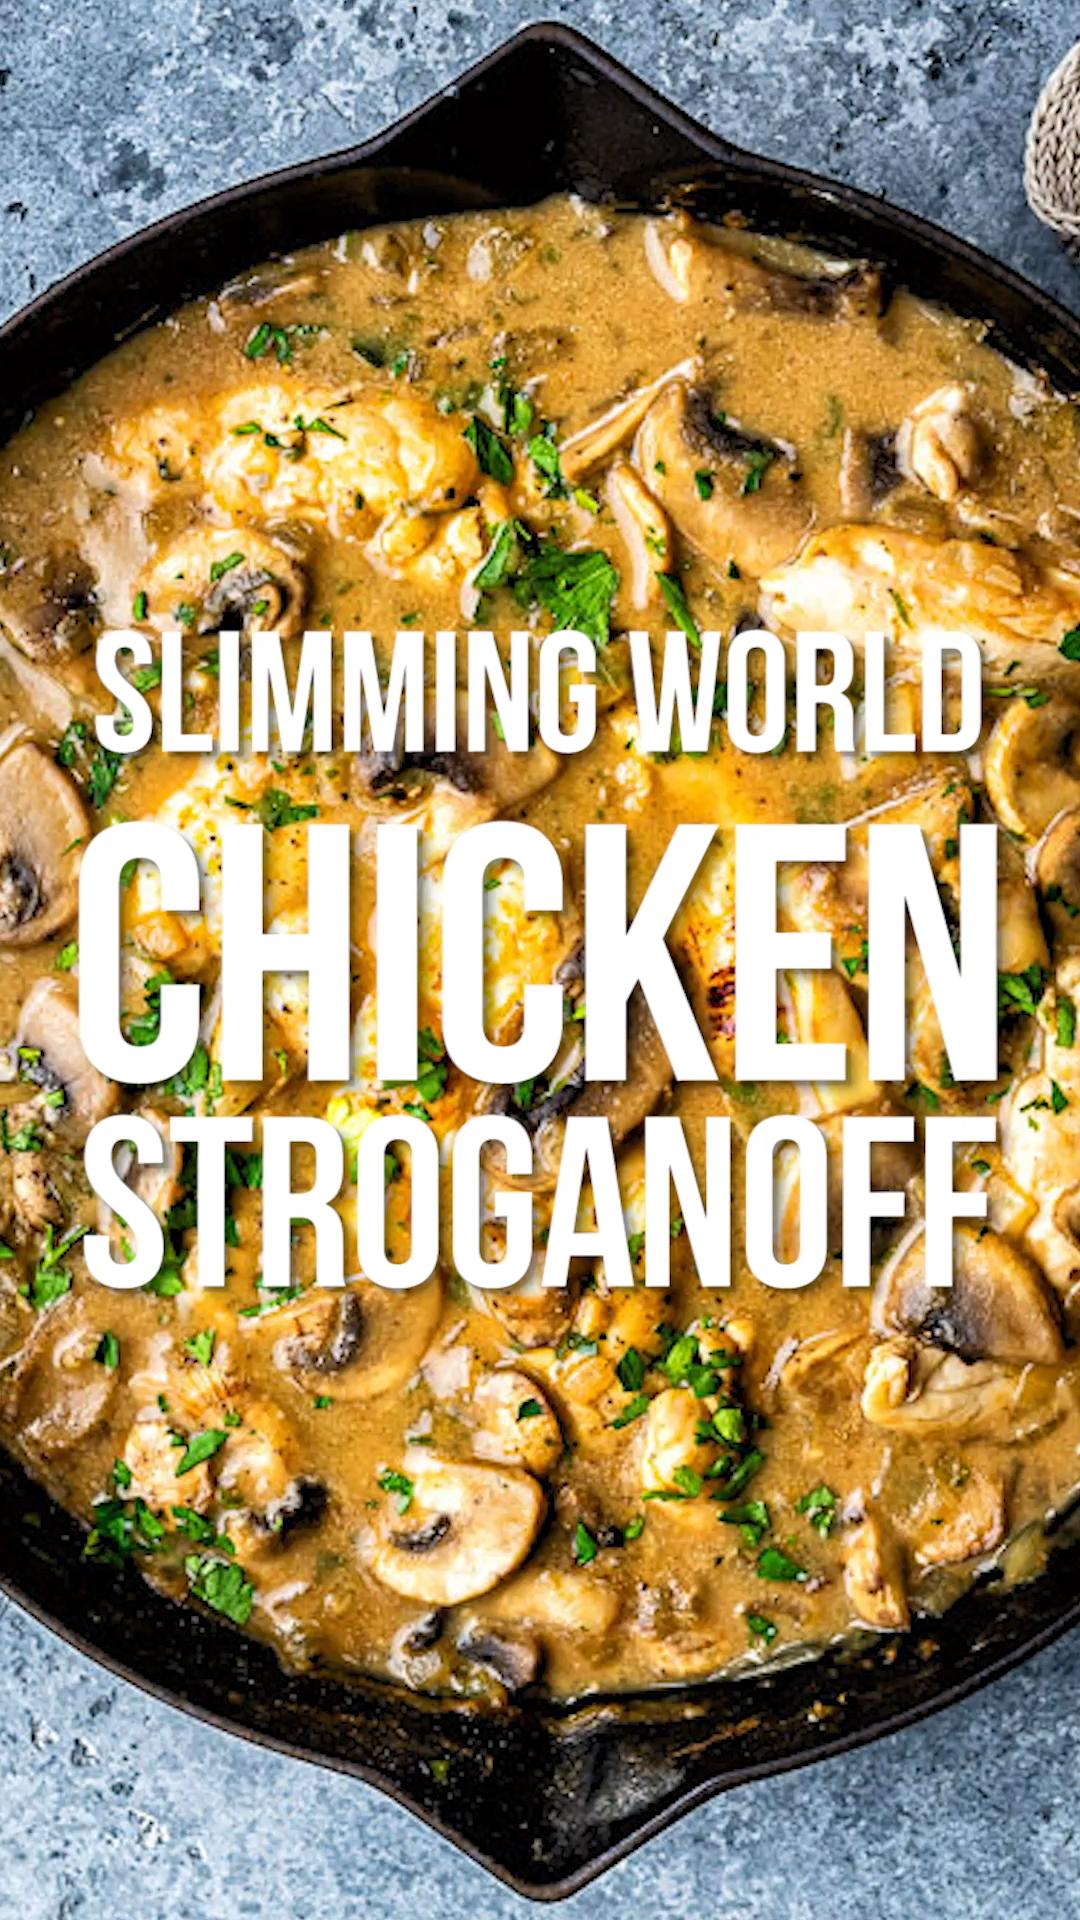 Chicken Stroganoff Slimming World Recipes Chicken Recipes Slimming Stroganoff World Chicken Recipes Easy Chicken Recipes Chicken Stroganoff